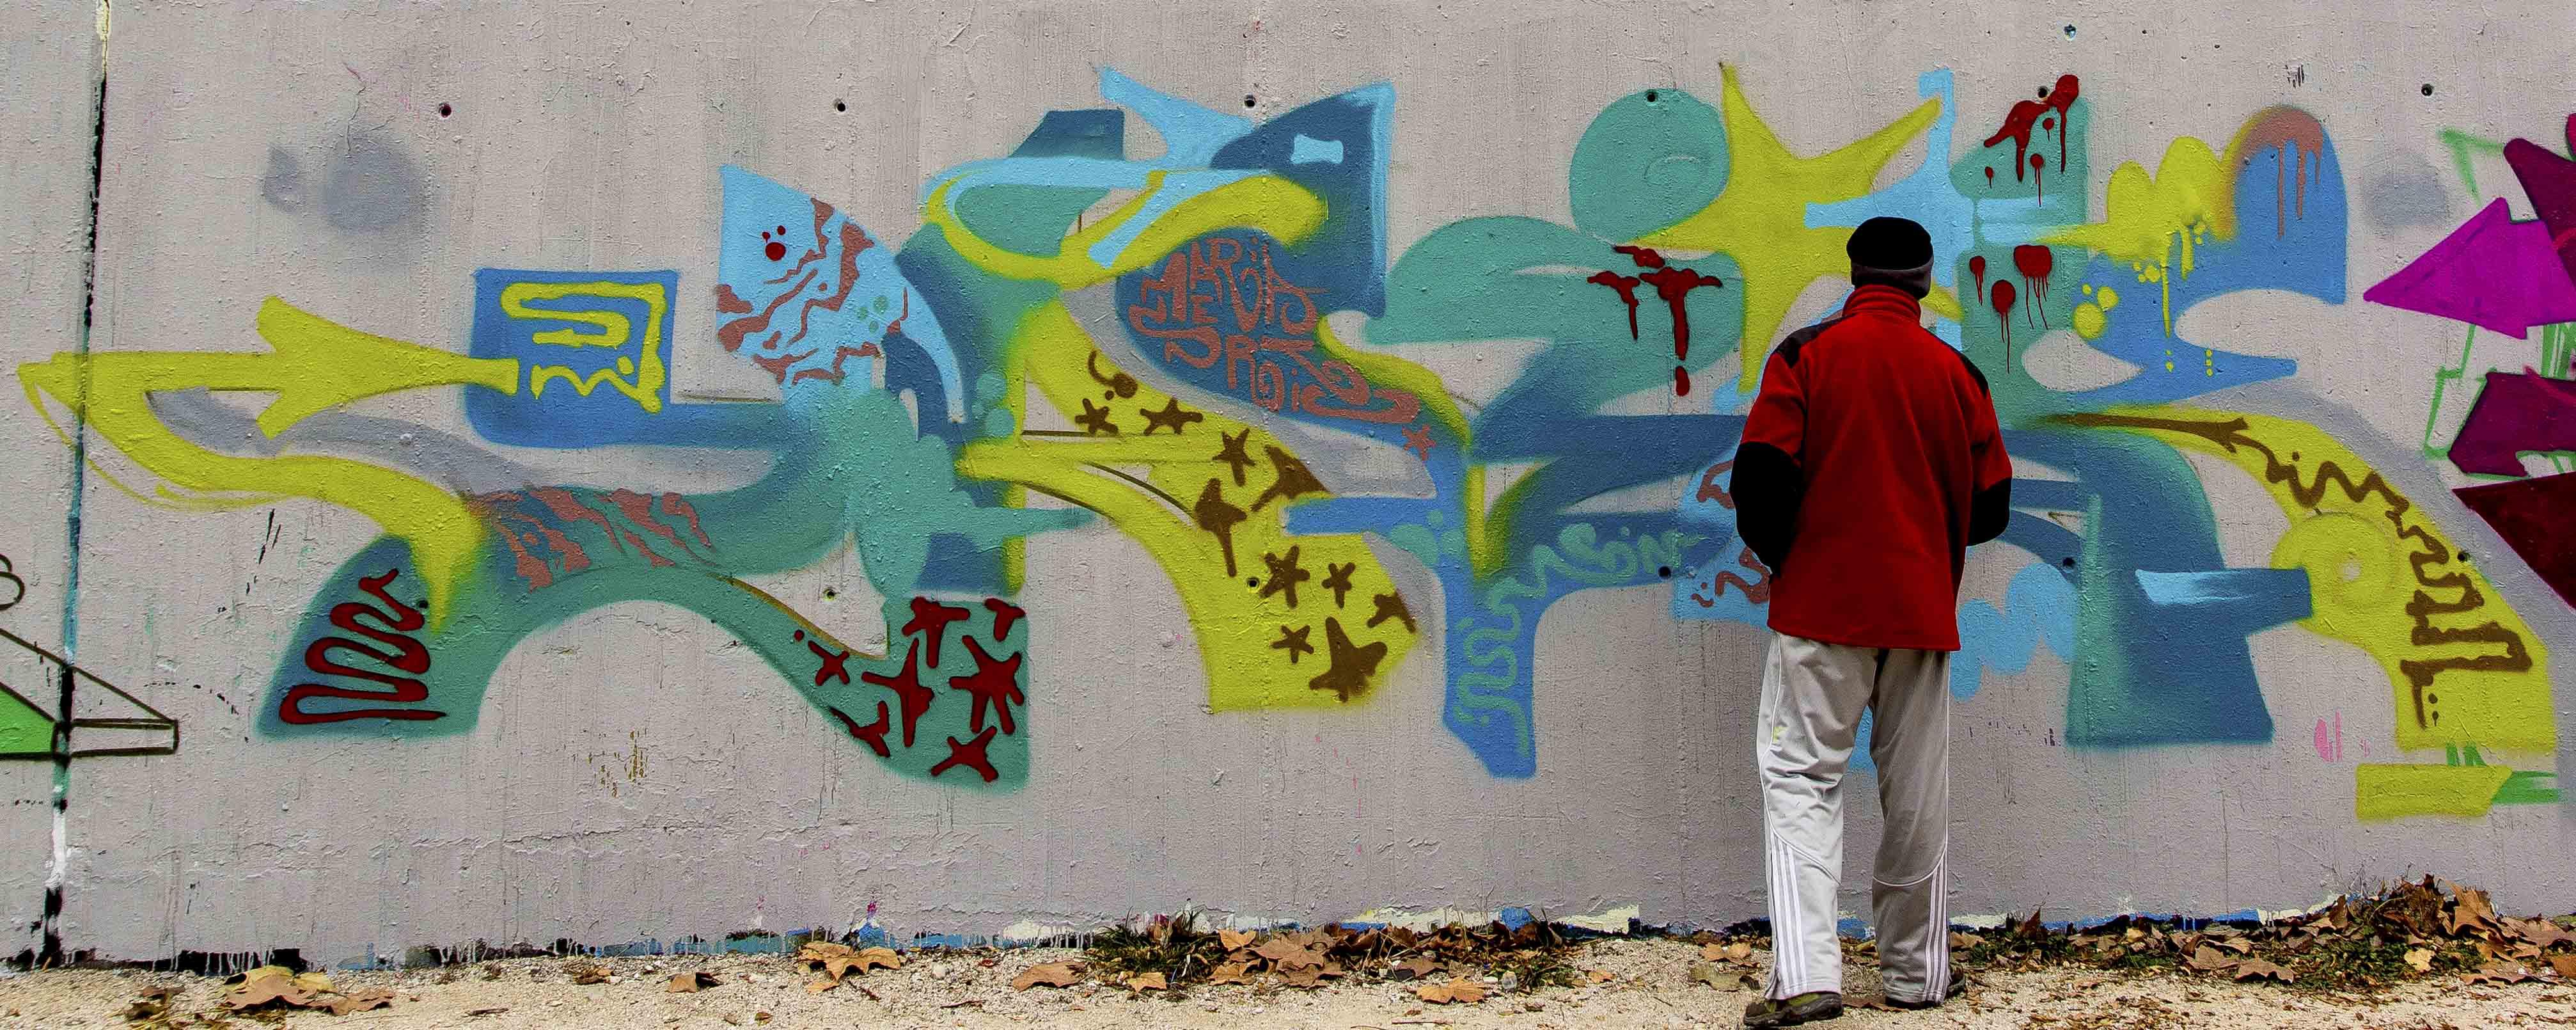 High Resolution Wallpaper   Razer Blue Graffiti 4028x1610 px